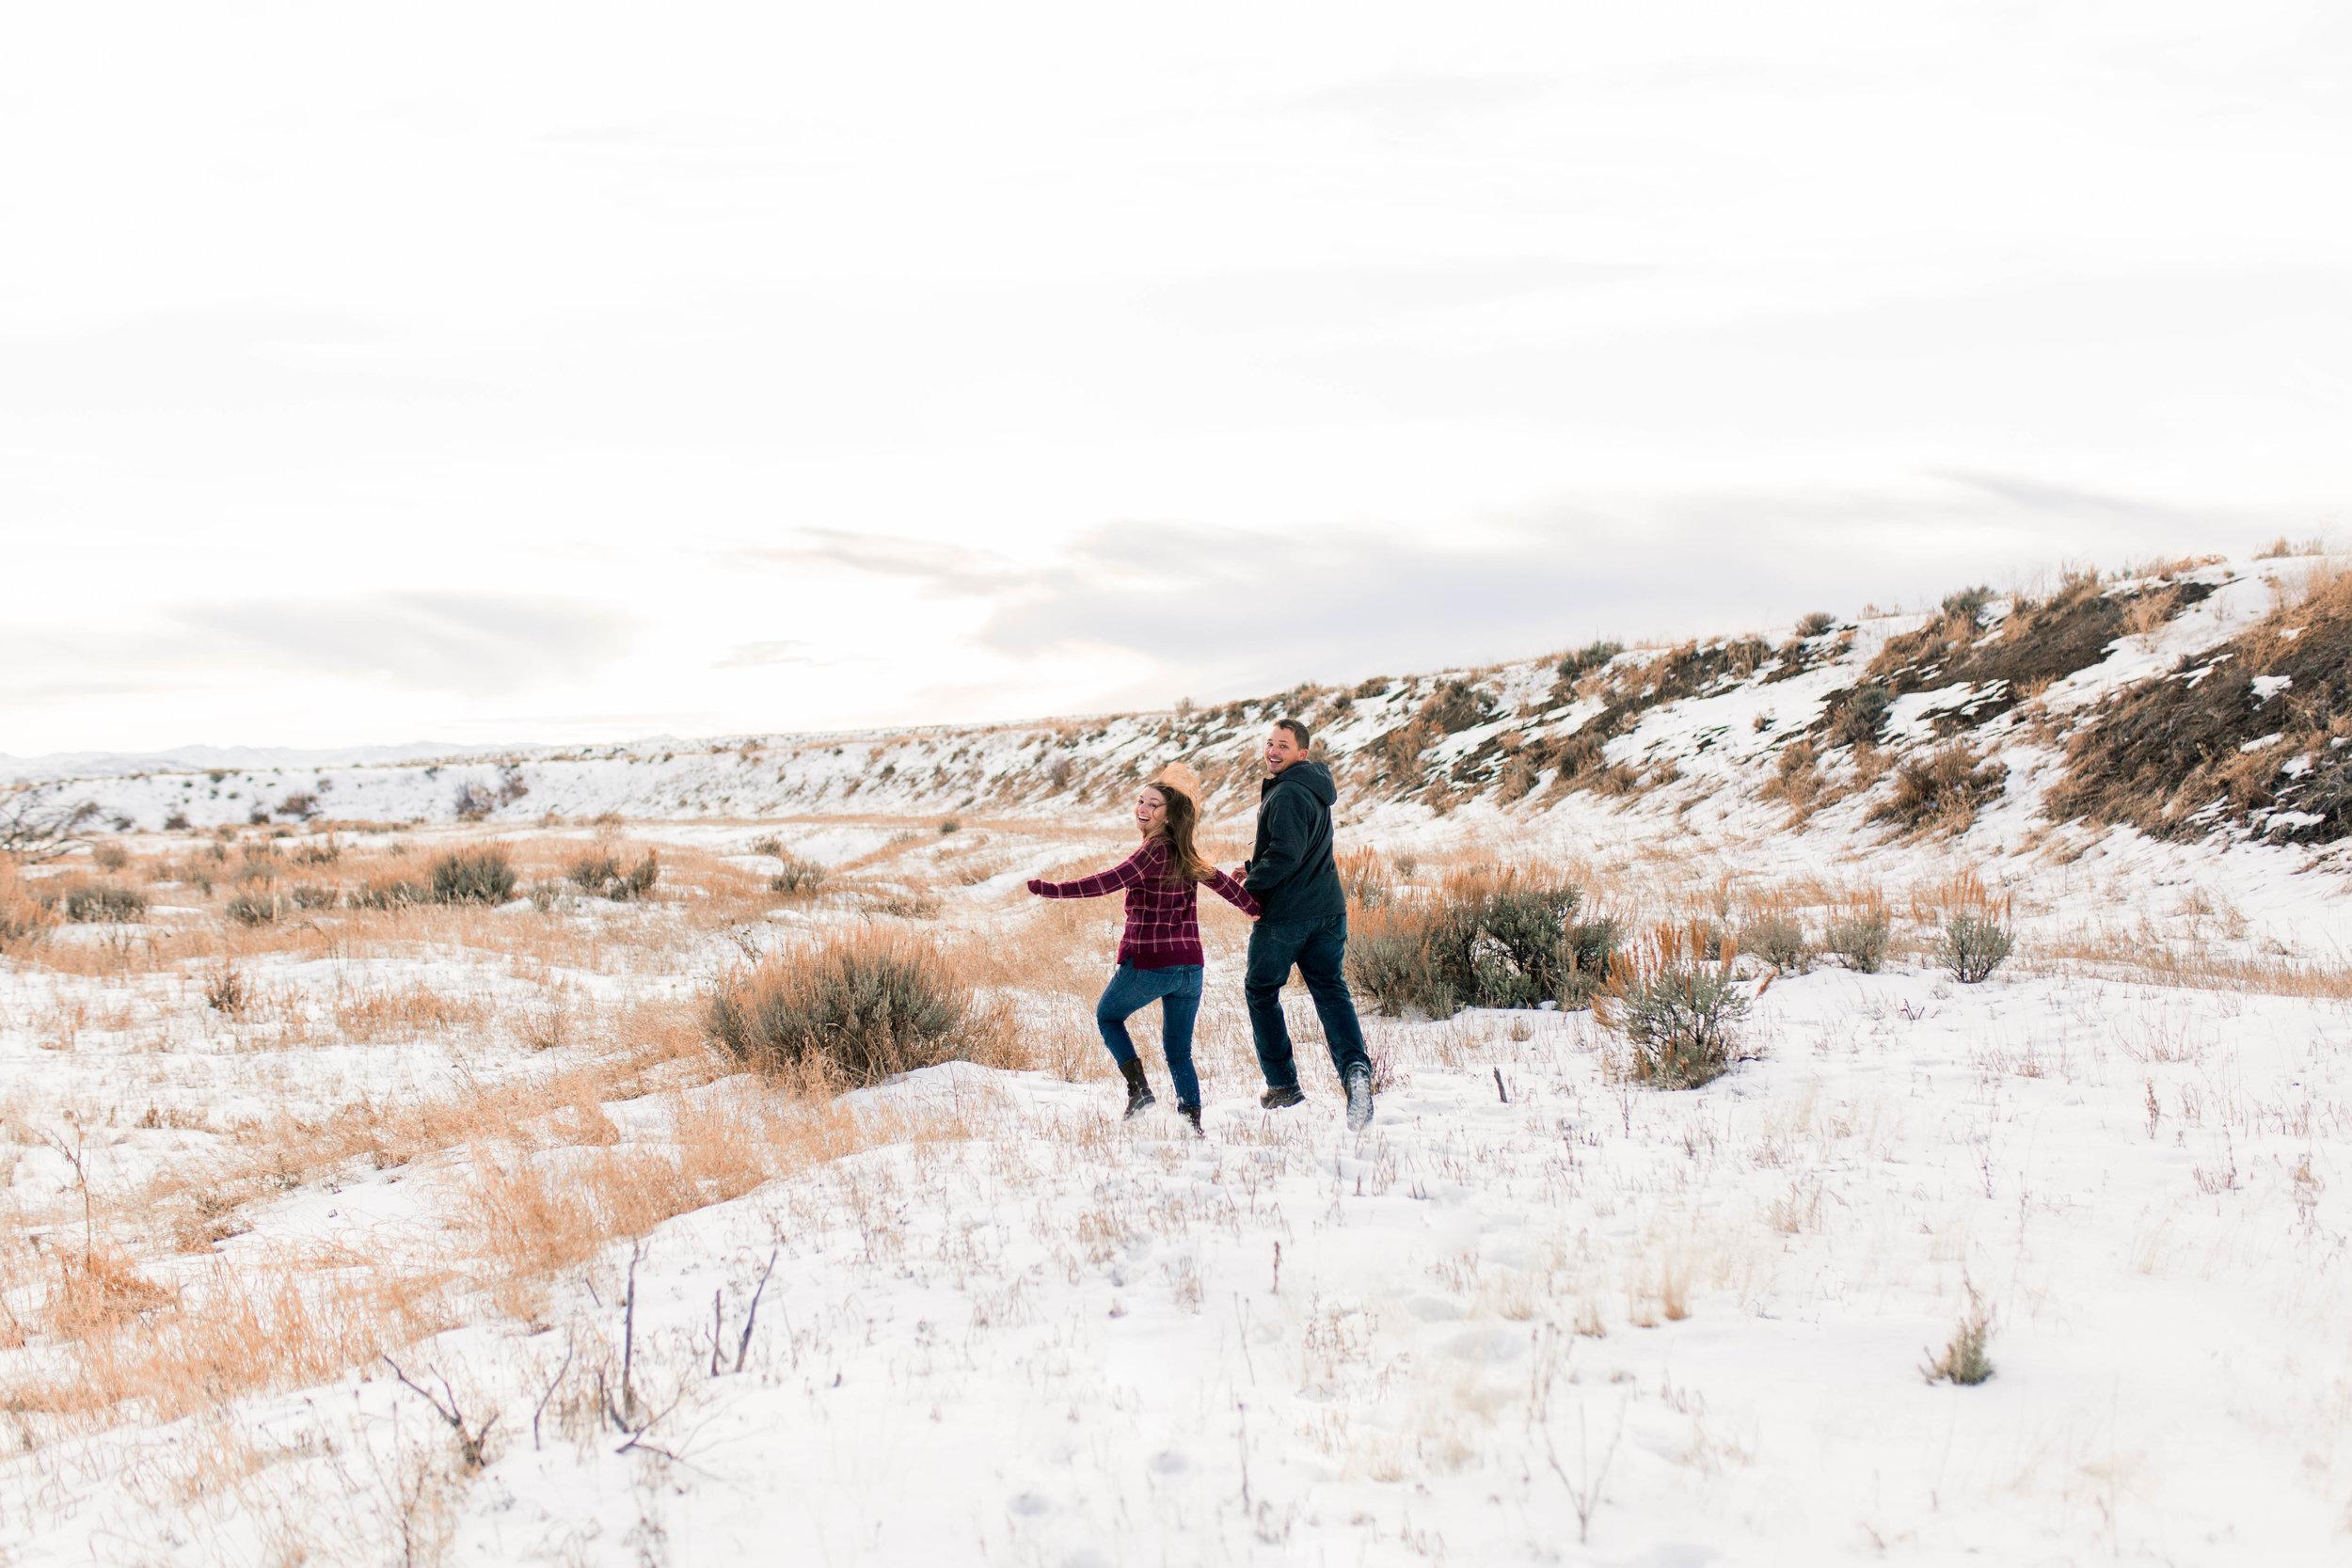 nicole-daacke-photography-grand-teton-elopement-grand-teton-wedding-national-park-wedding-adventure-wedding-adventurous-engagement-session-snowy-winter-inspiration-photographer-3.jpg